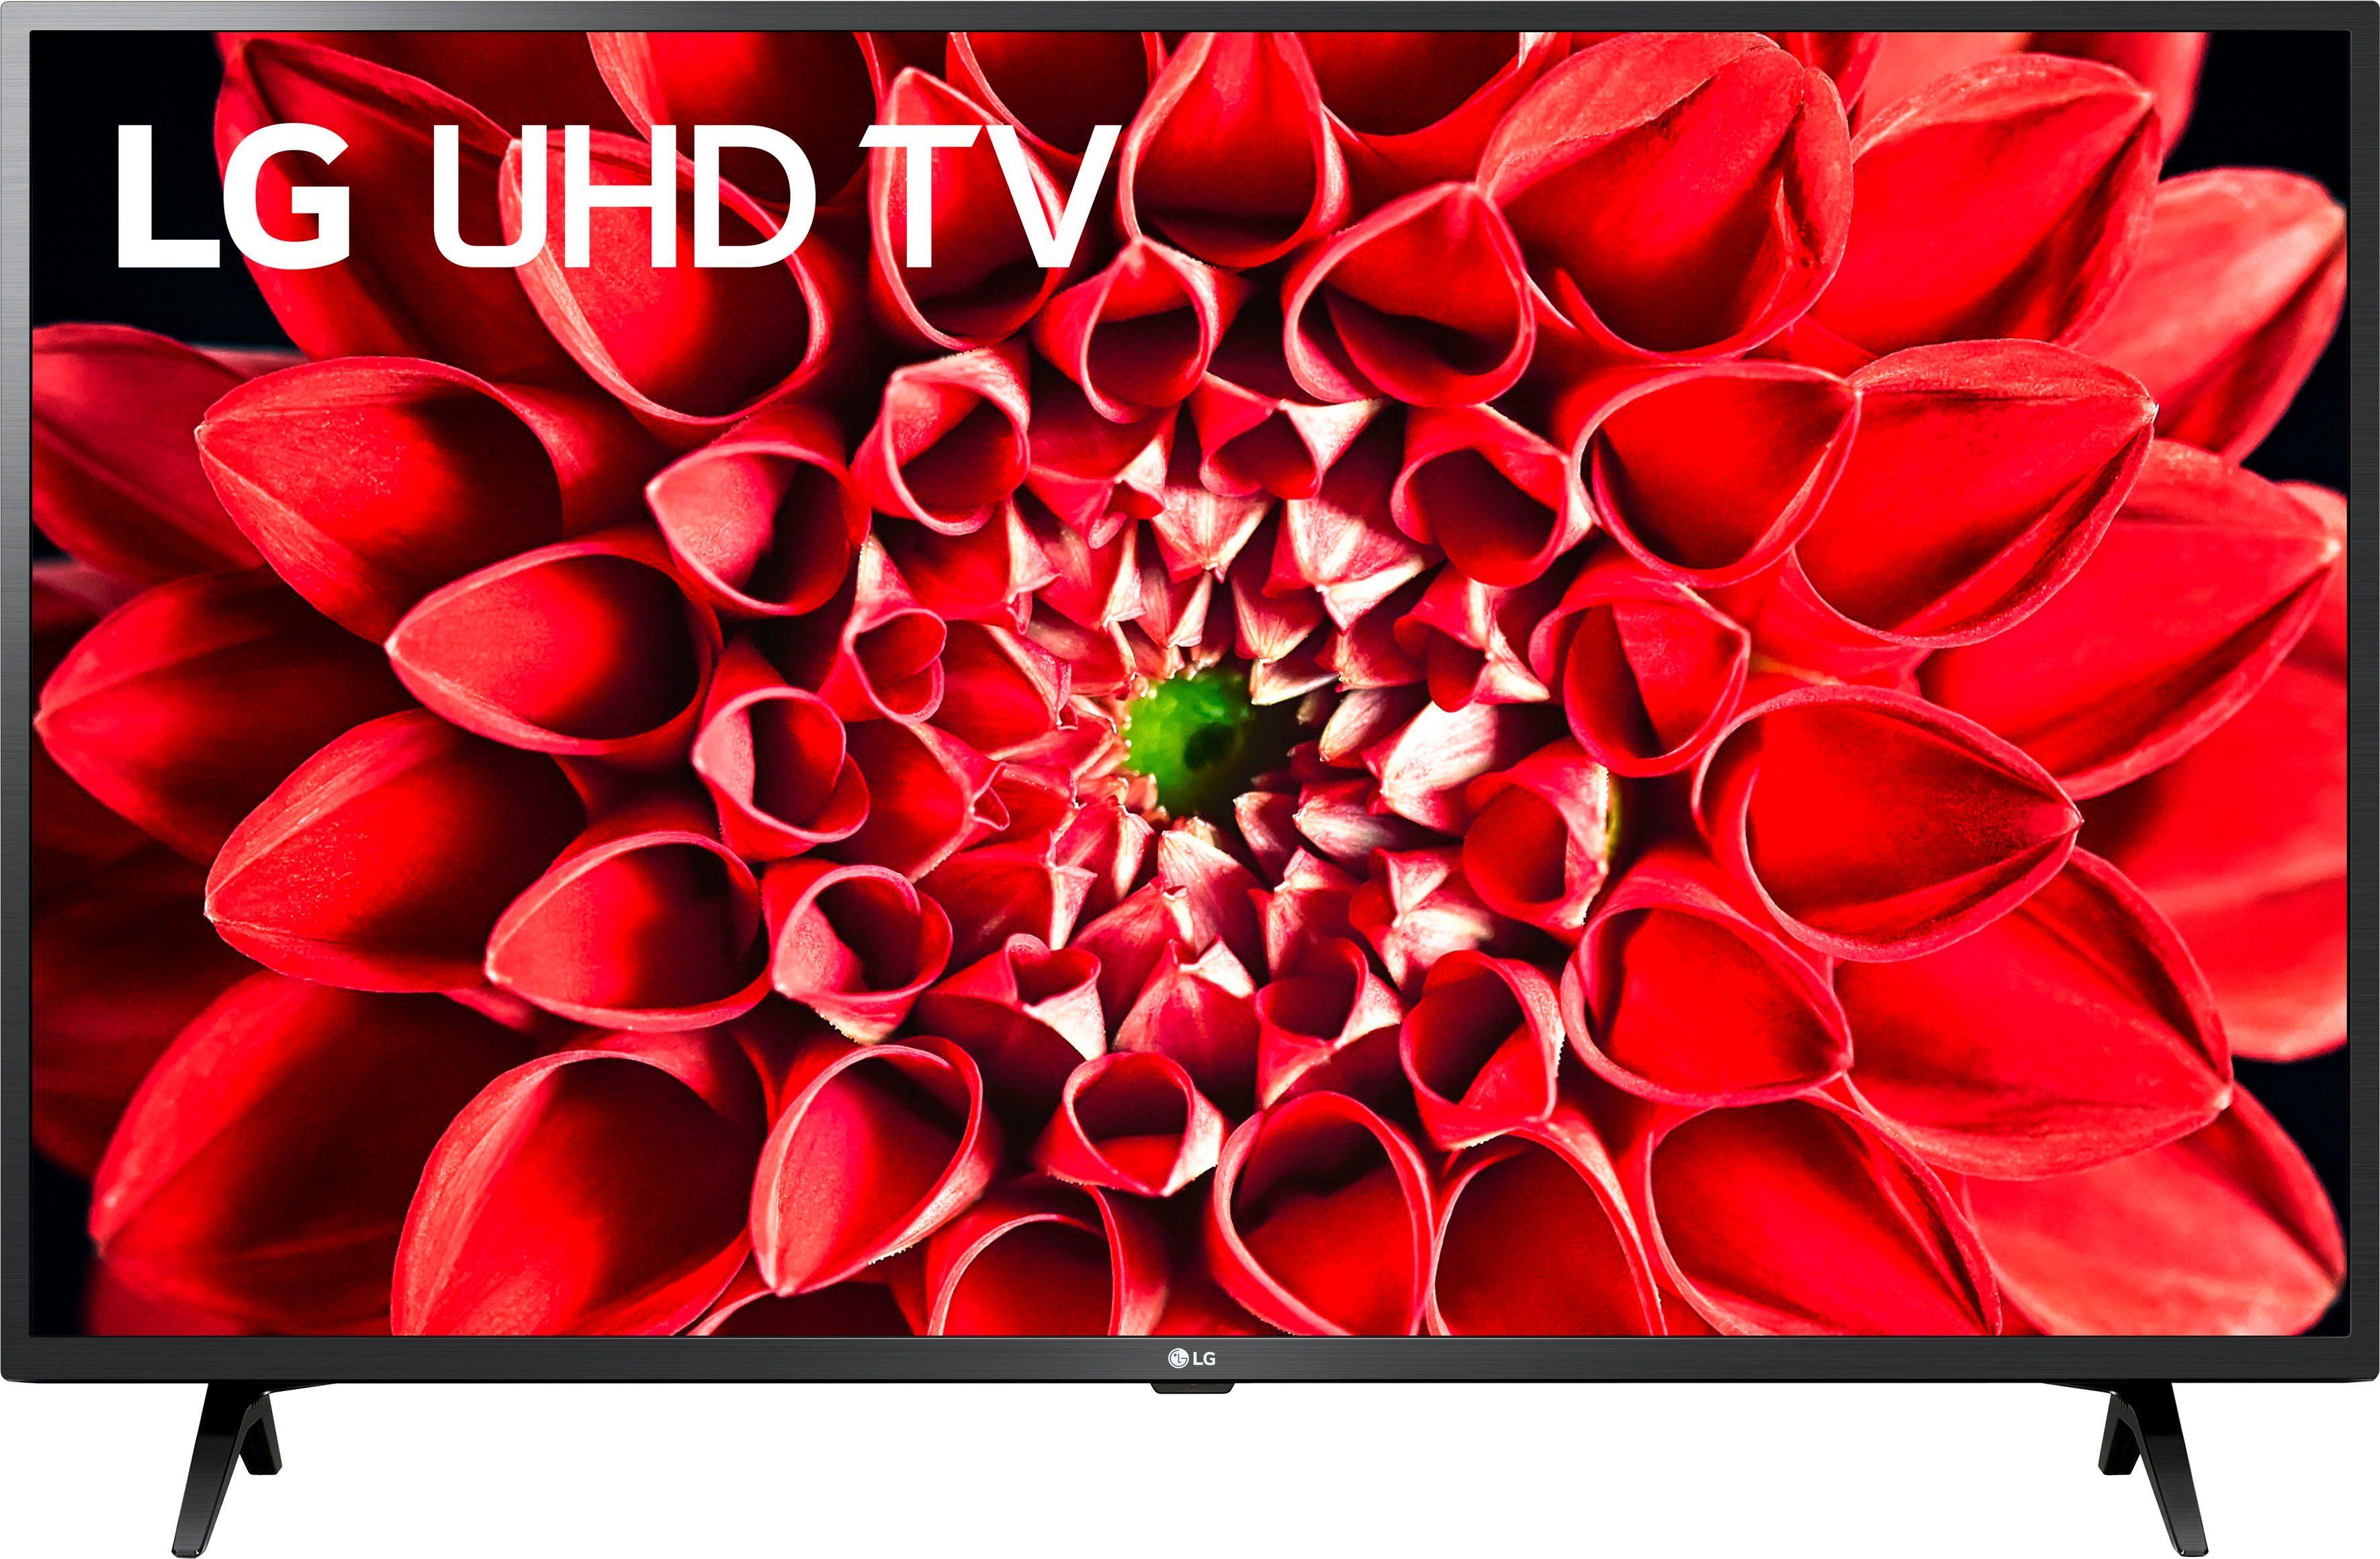 lg 50un73006la led fernseher 126 cm 50 zoll 4k ultra hd smart tv hdr10 pro google assistant alexa airplay 2 magic remote fernbedienung online